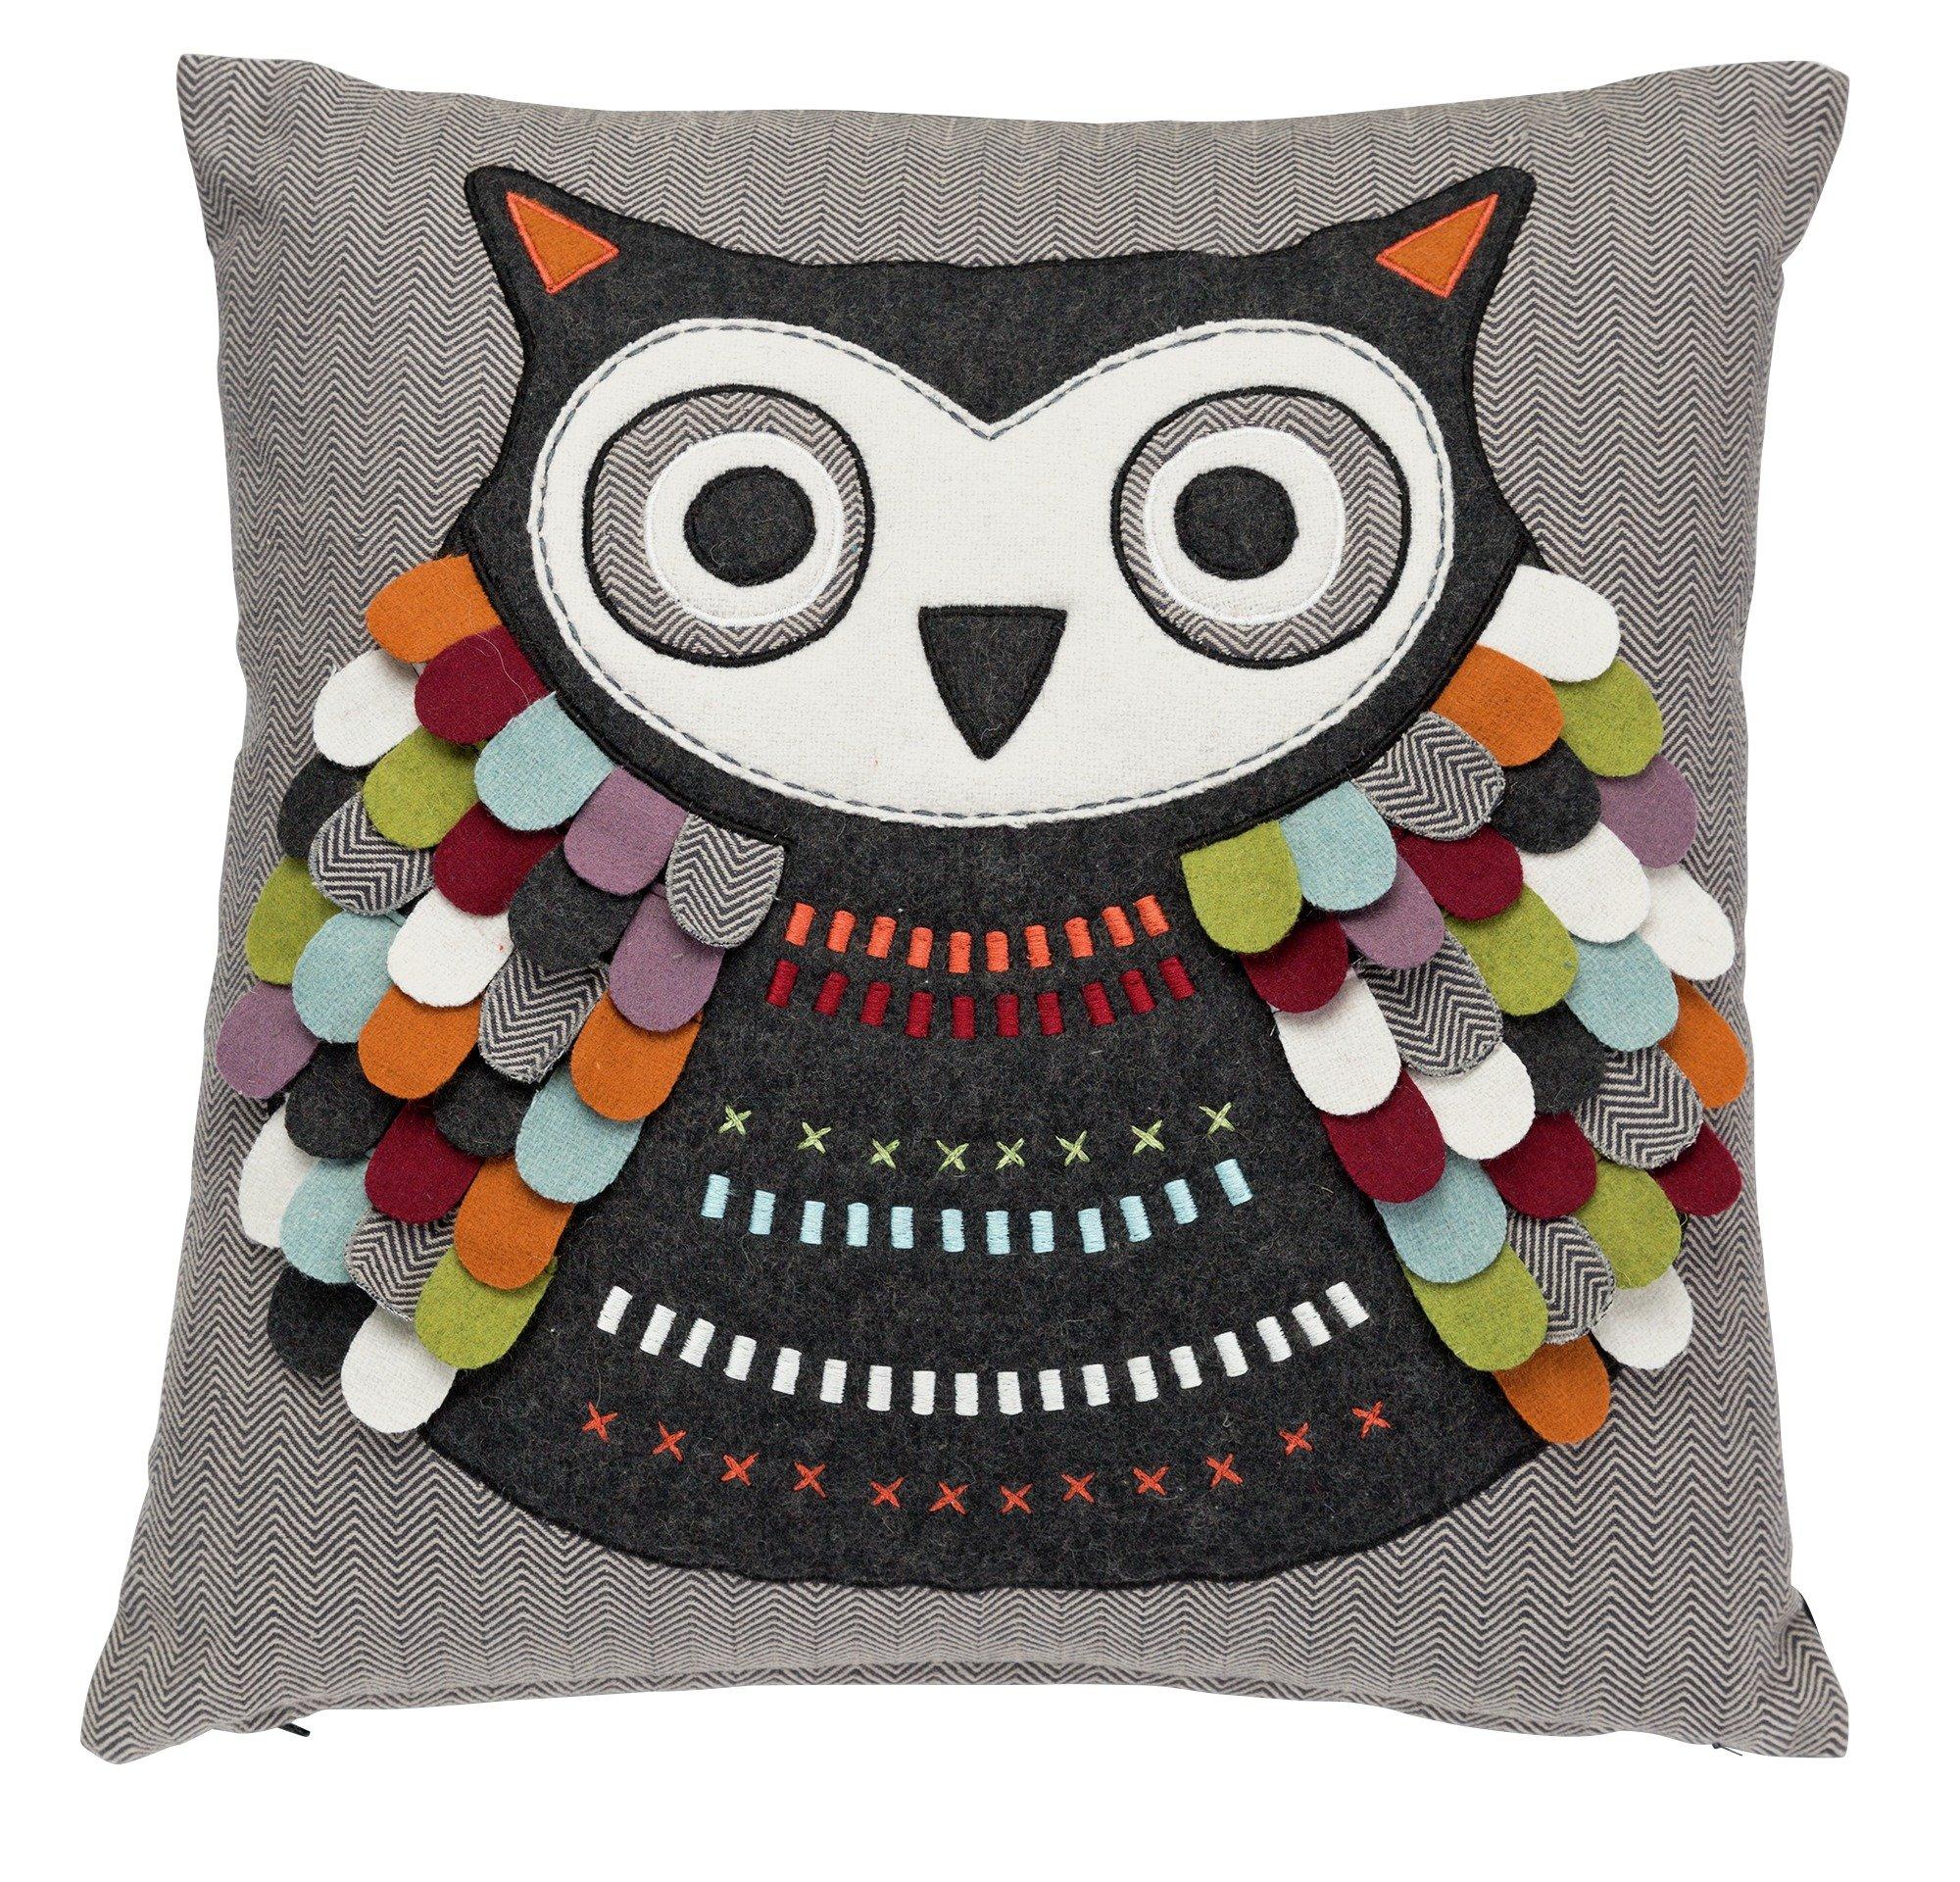 heart of house oola owl cushion gay times uk. Black Bedroom Furniture Sets. Home Design Ideas